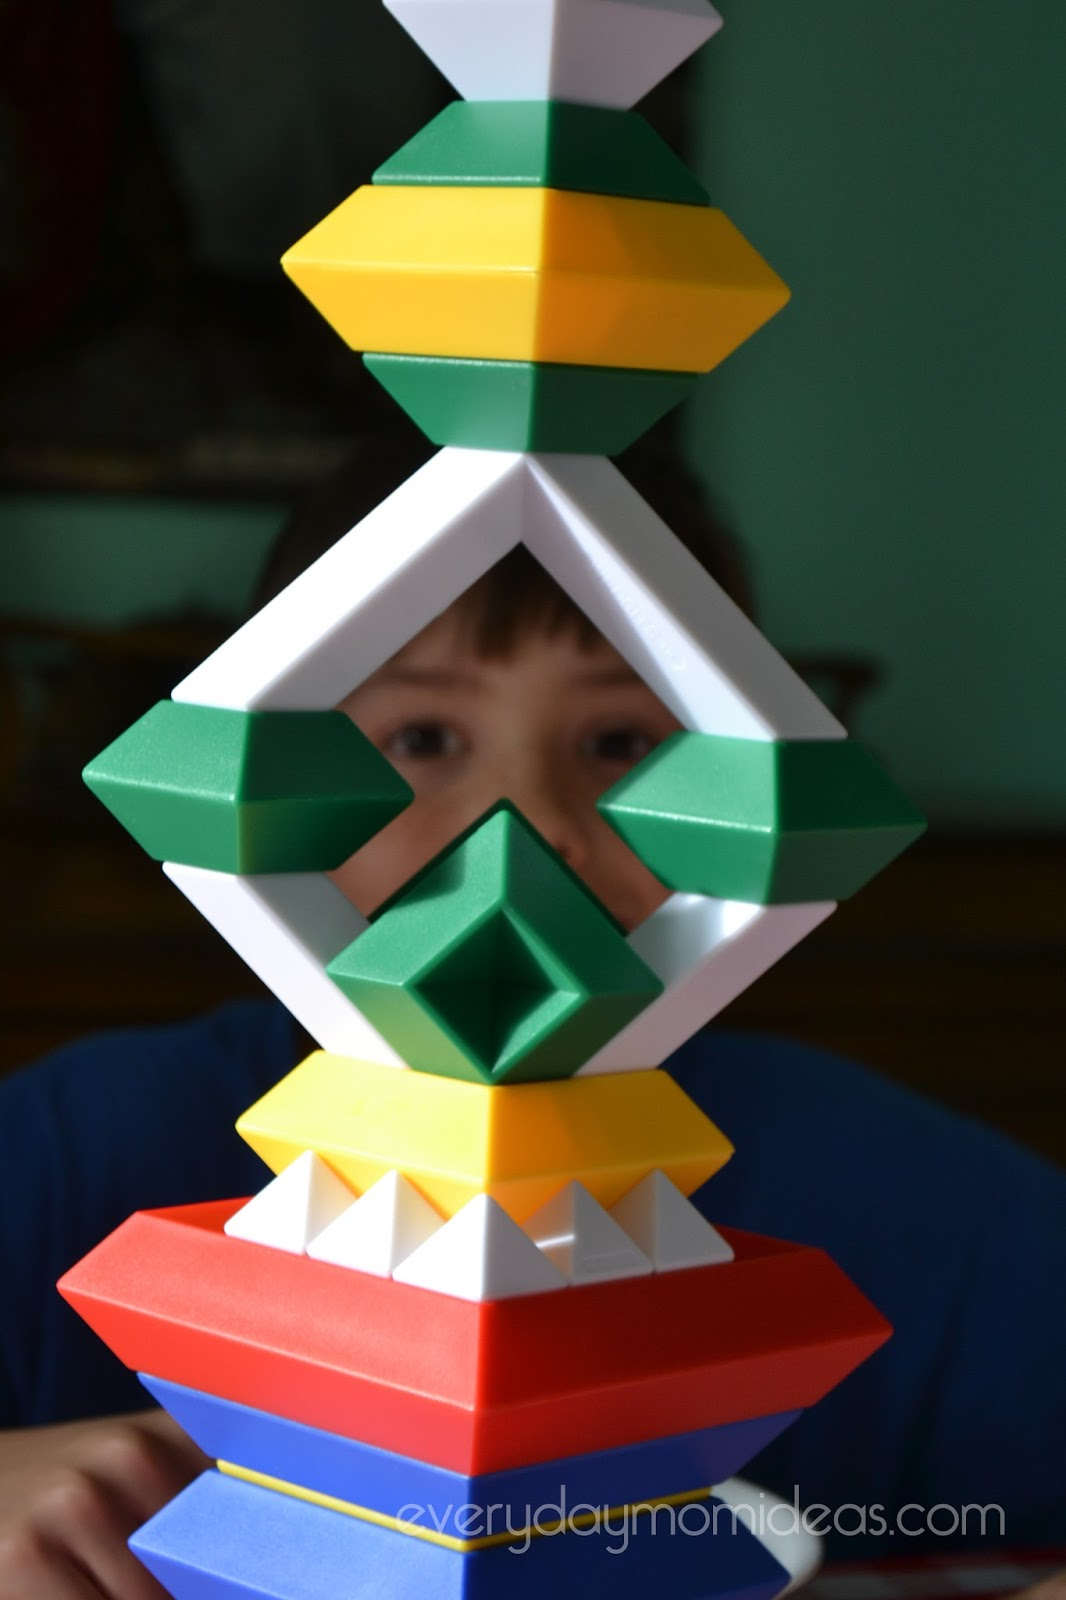 Building Blocks Of Art : Building blocks of art everyday mom ideas